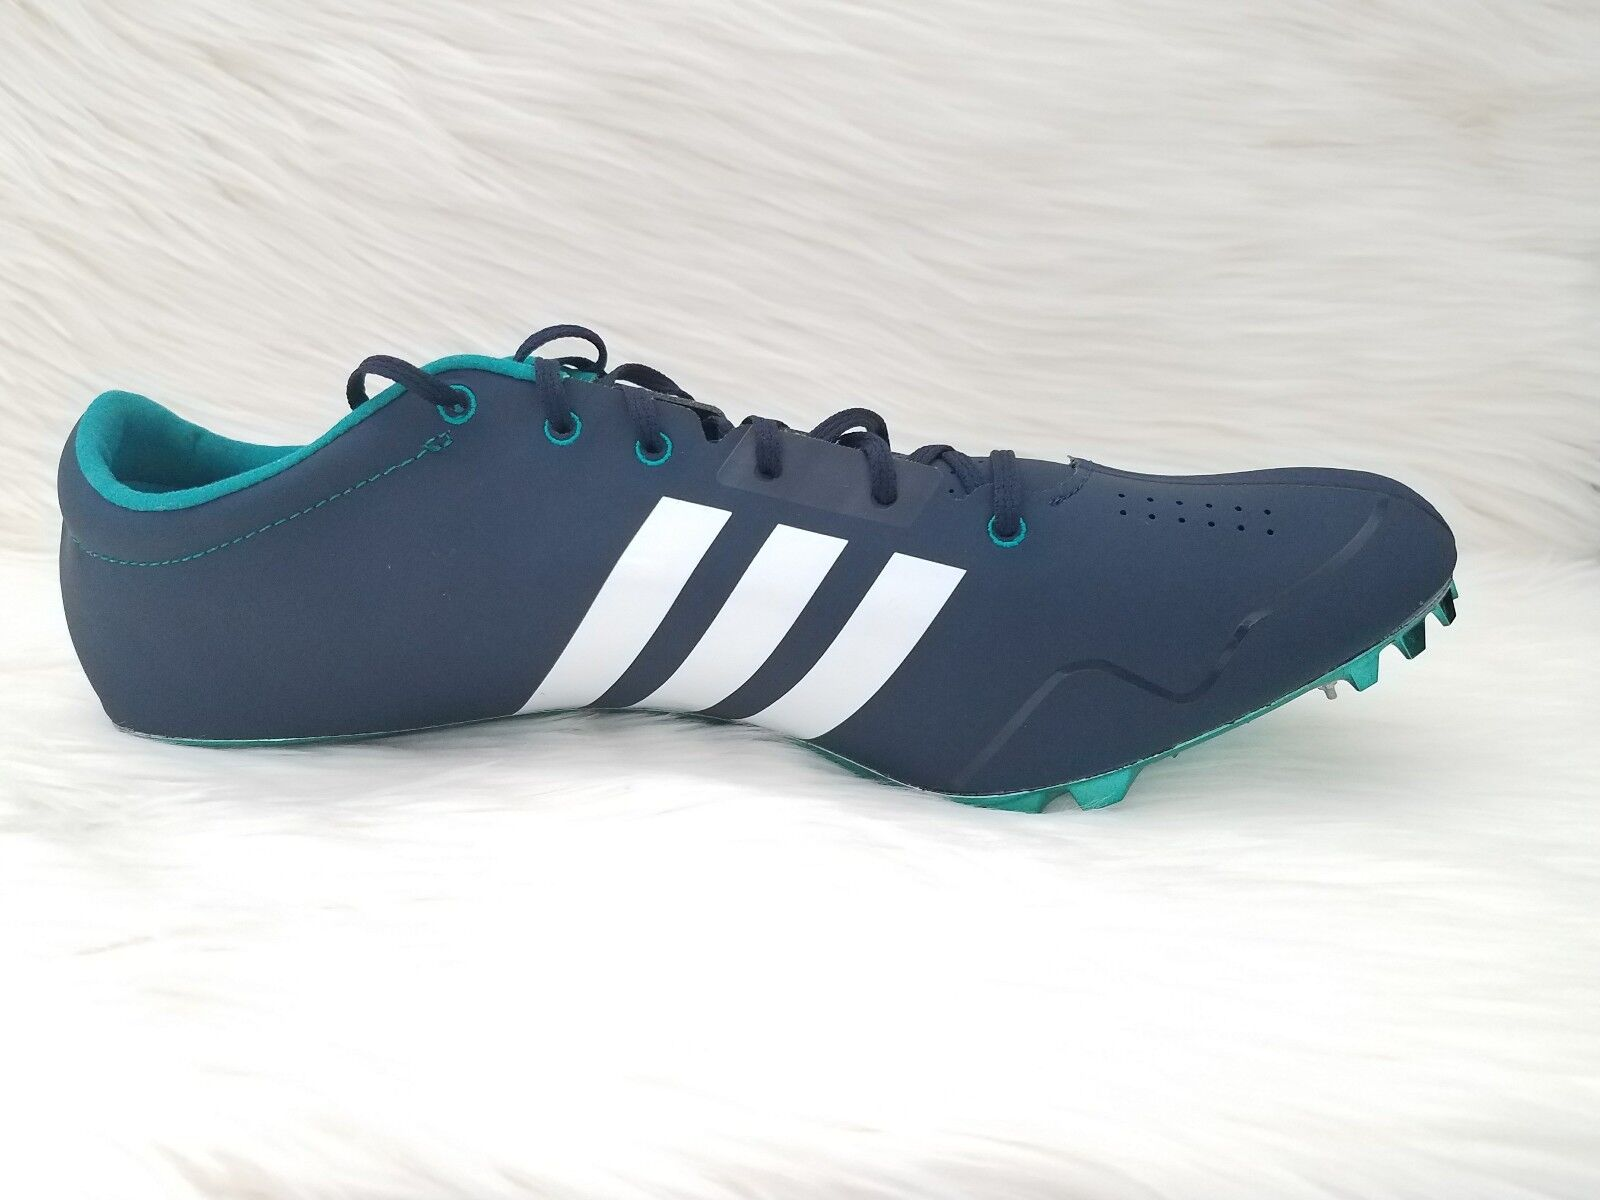 Neue prime männer 12,5 adidas adizero prime Neue sp / sprint track spikes / stollen af5662 e75ba4